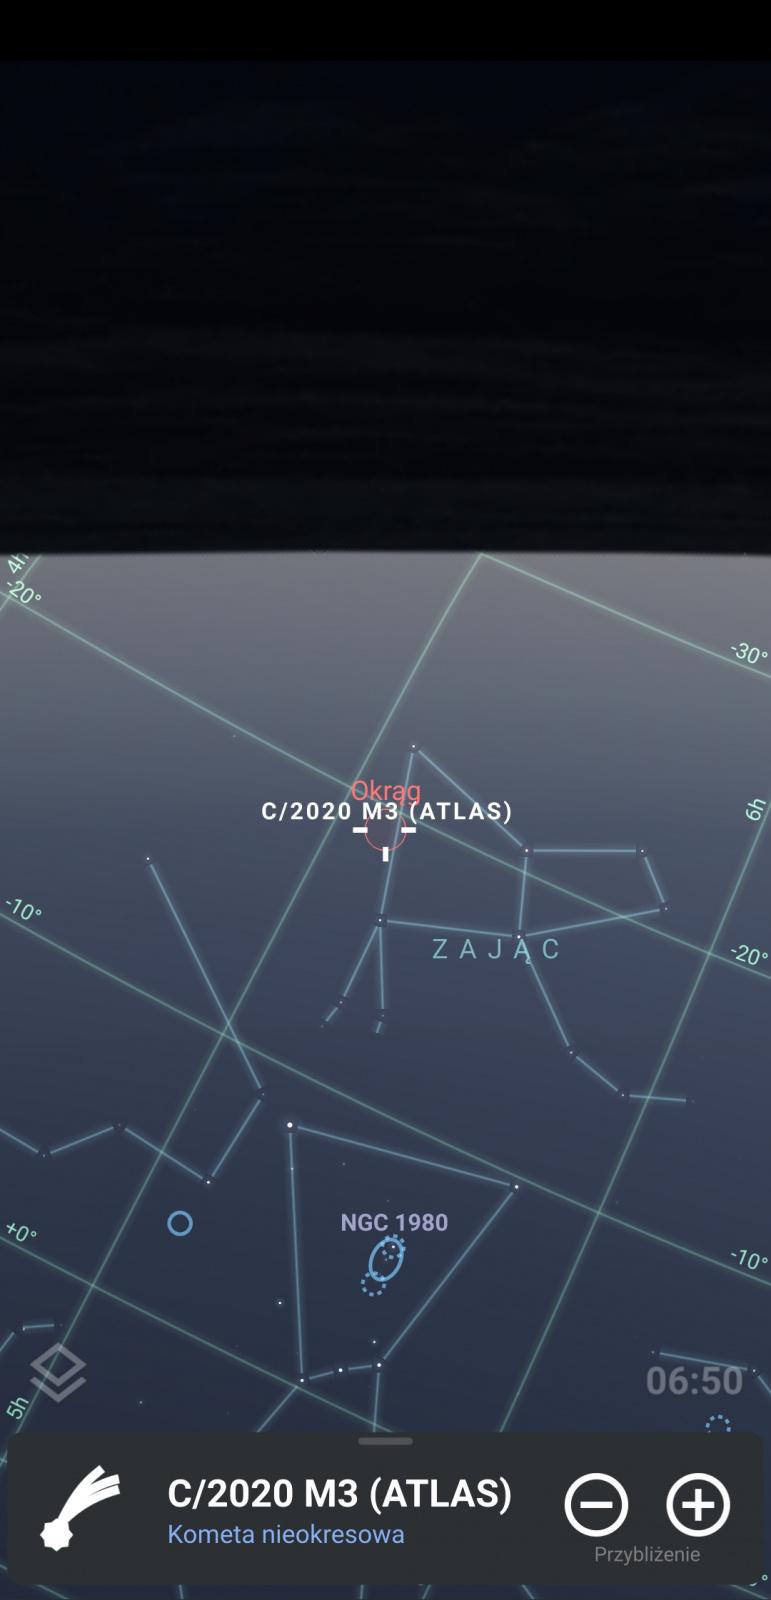 Screenshot_20201024_065053_com.noctuasoftware.stellarium_plus.thumb.jpg.4590773289158737ee76c812e82e202b.jpg